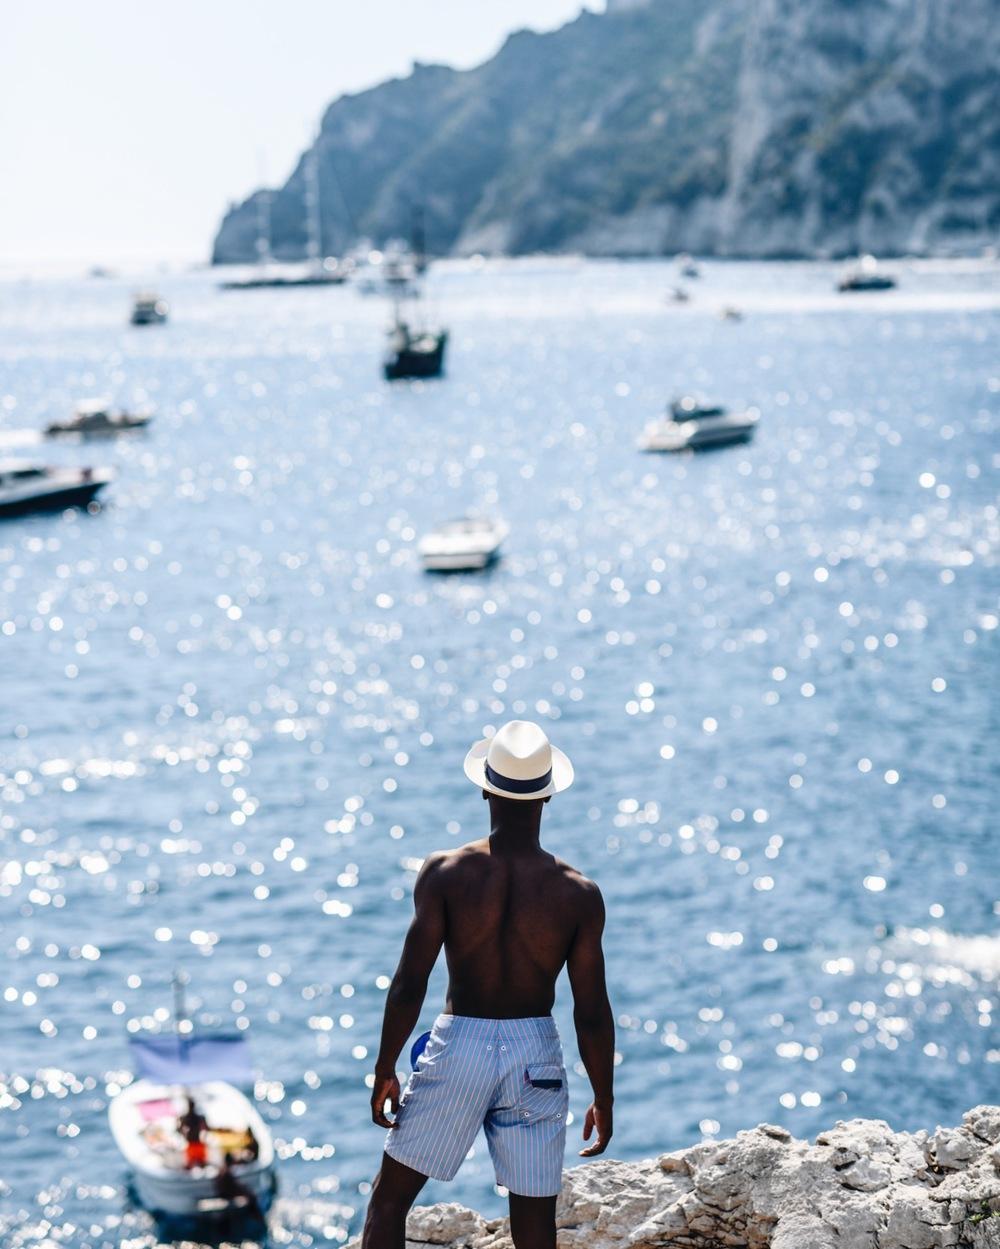 Veni-Vidi-Amavi-Dapper-Lou-Capri-Italy-Travel-Inspiration-2016-Blog.JPG